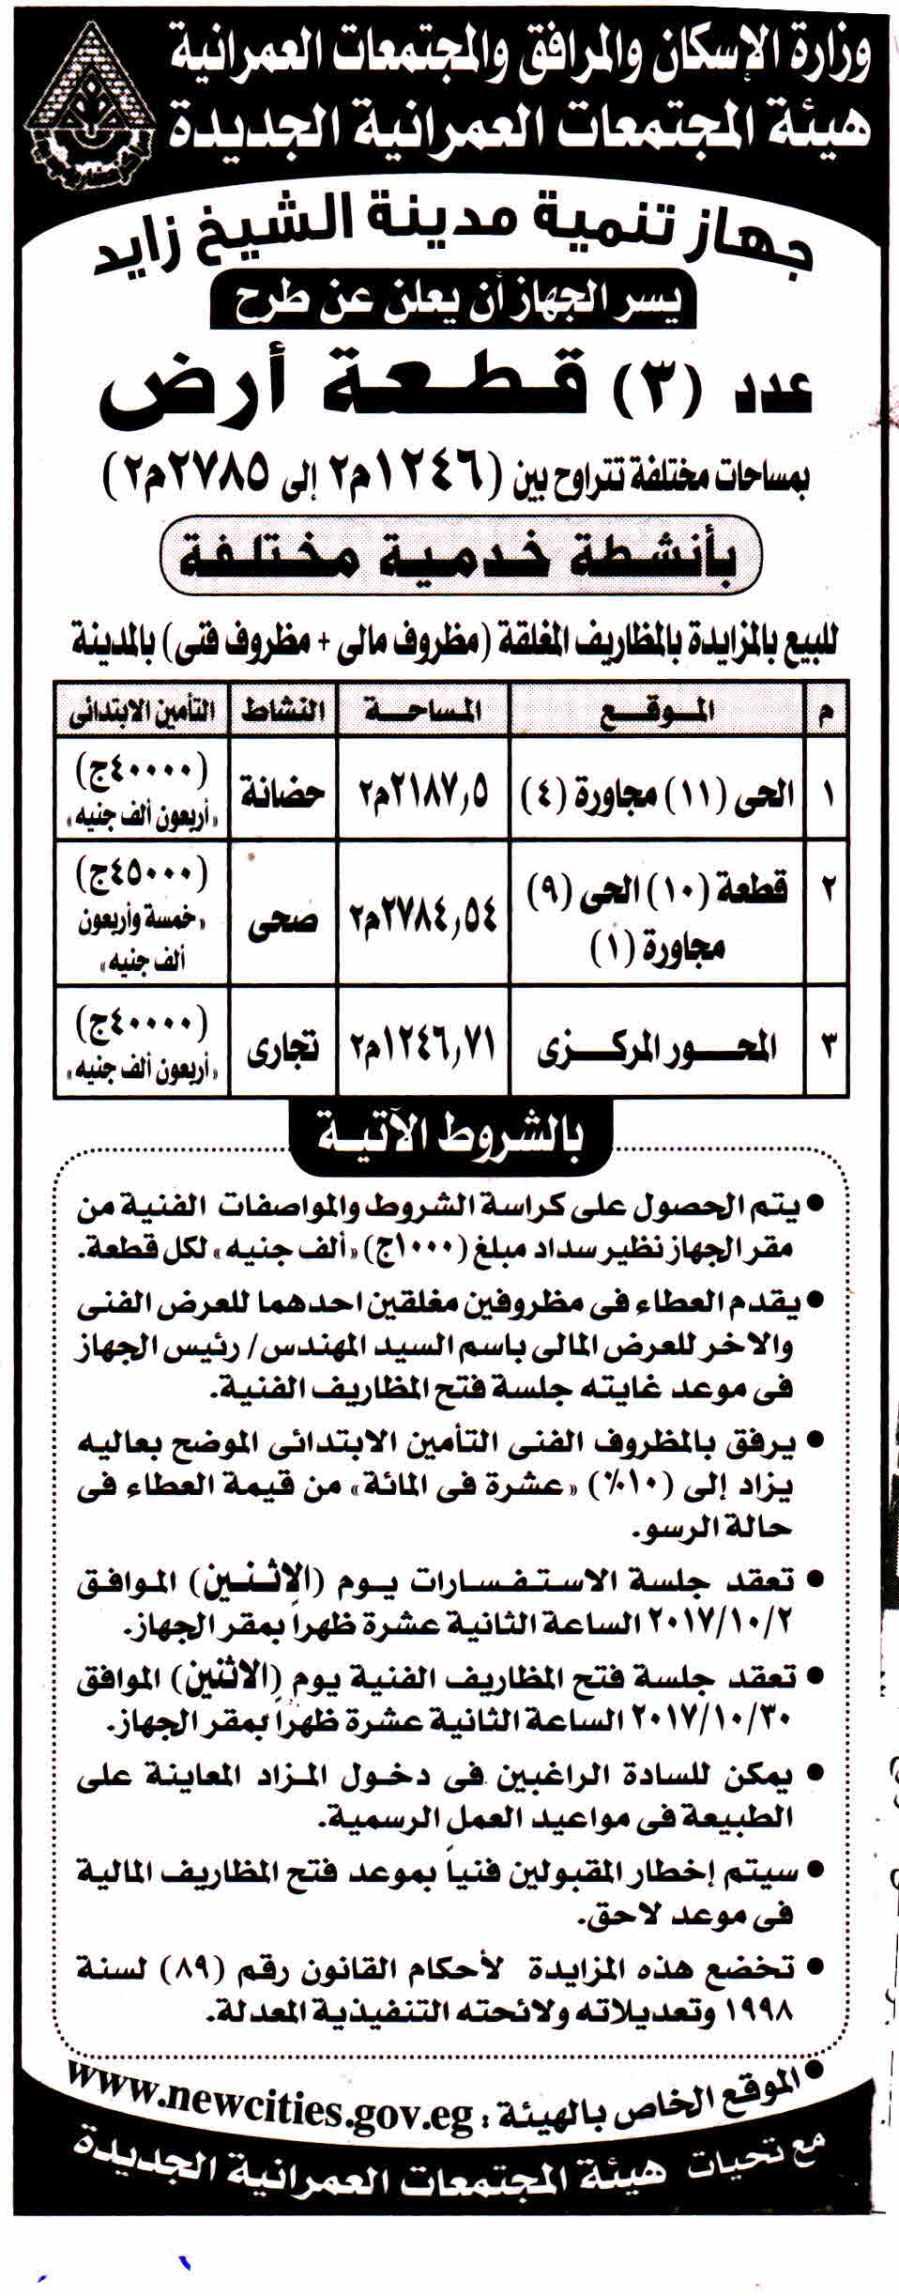 Al Akhbar 15 Sep P.3.jpg